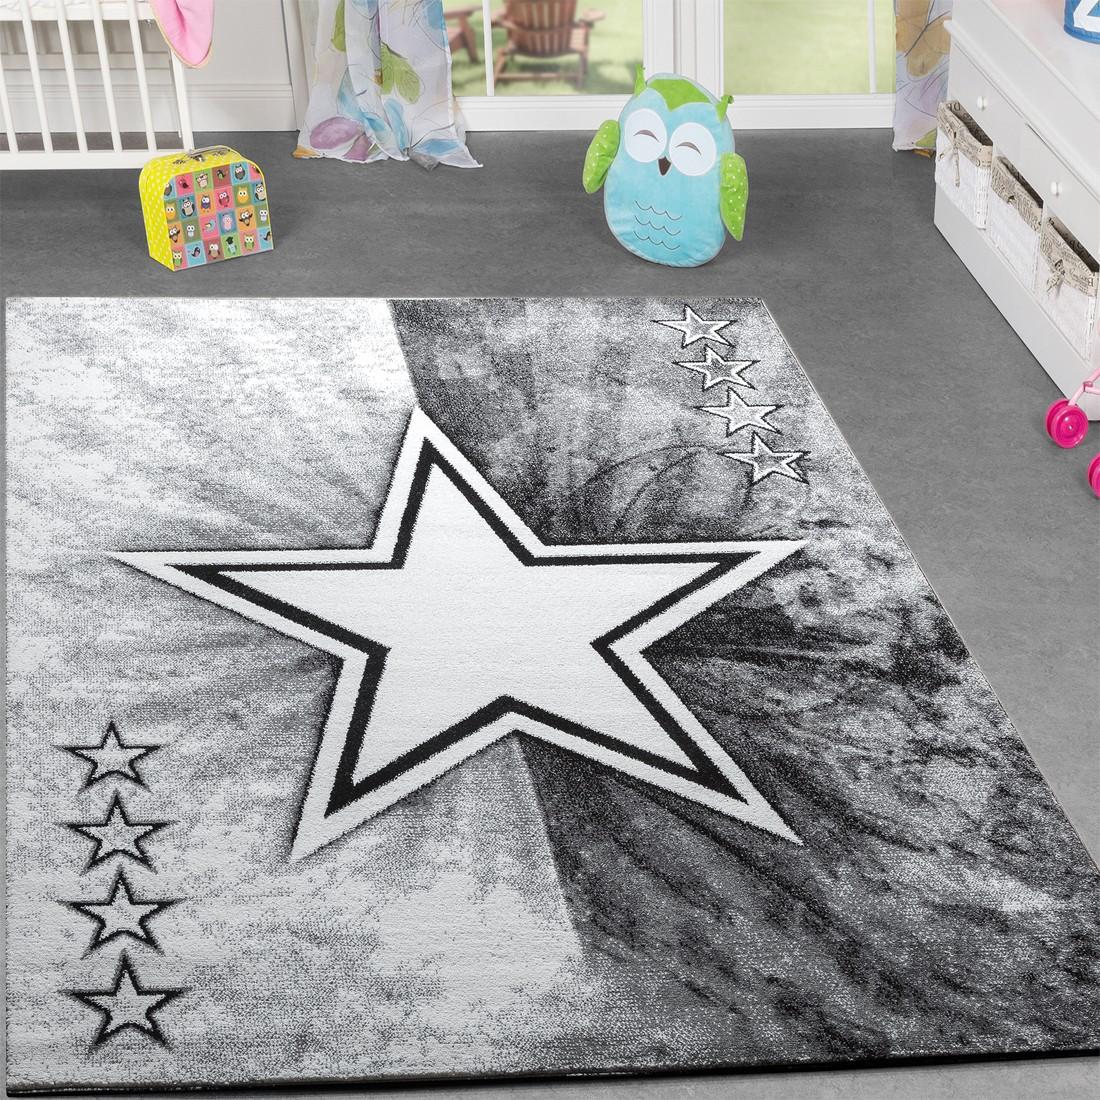 Full Size of Teppich Jugend Modern Stern Design Kinderzimmer Regal Regale Sofa Weiß Kinderzimmer Teppichboden Kinderzimmer